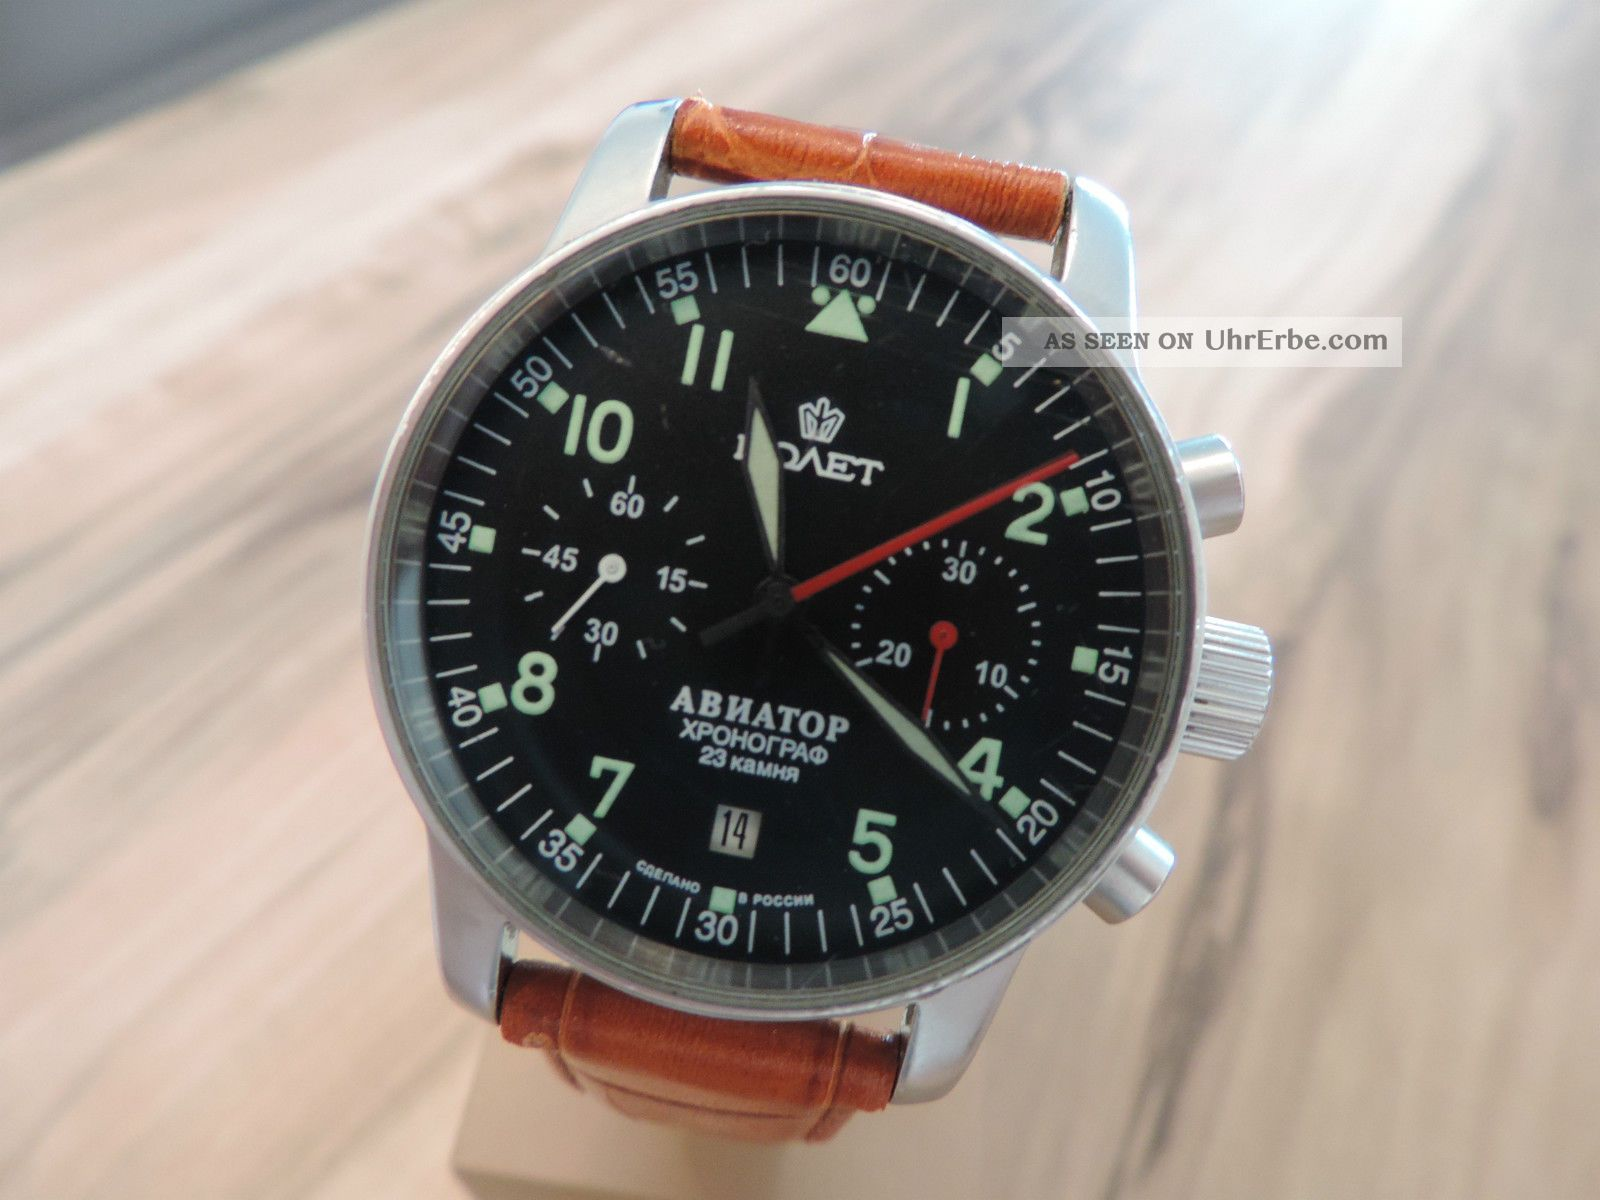 Poljot Aviator 1 - Flieger Chrono - P3133 Handaufzugswerk - Sehr Seltene Hau - Armbanduhren Bild